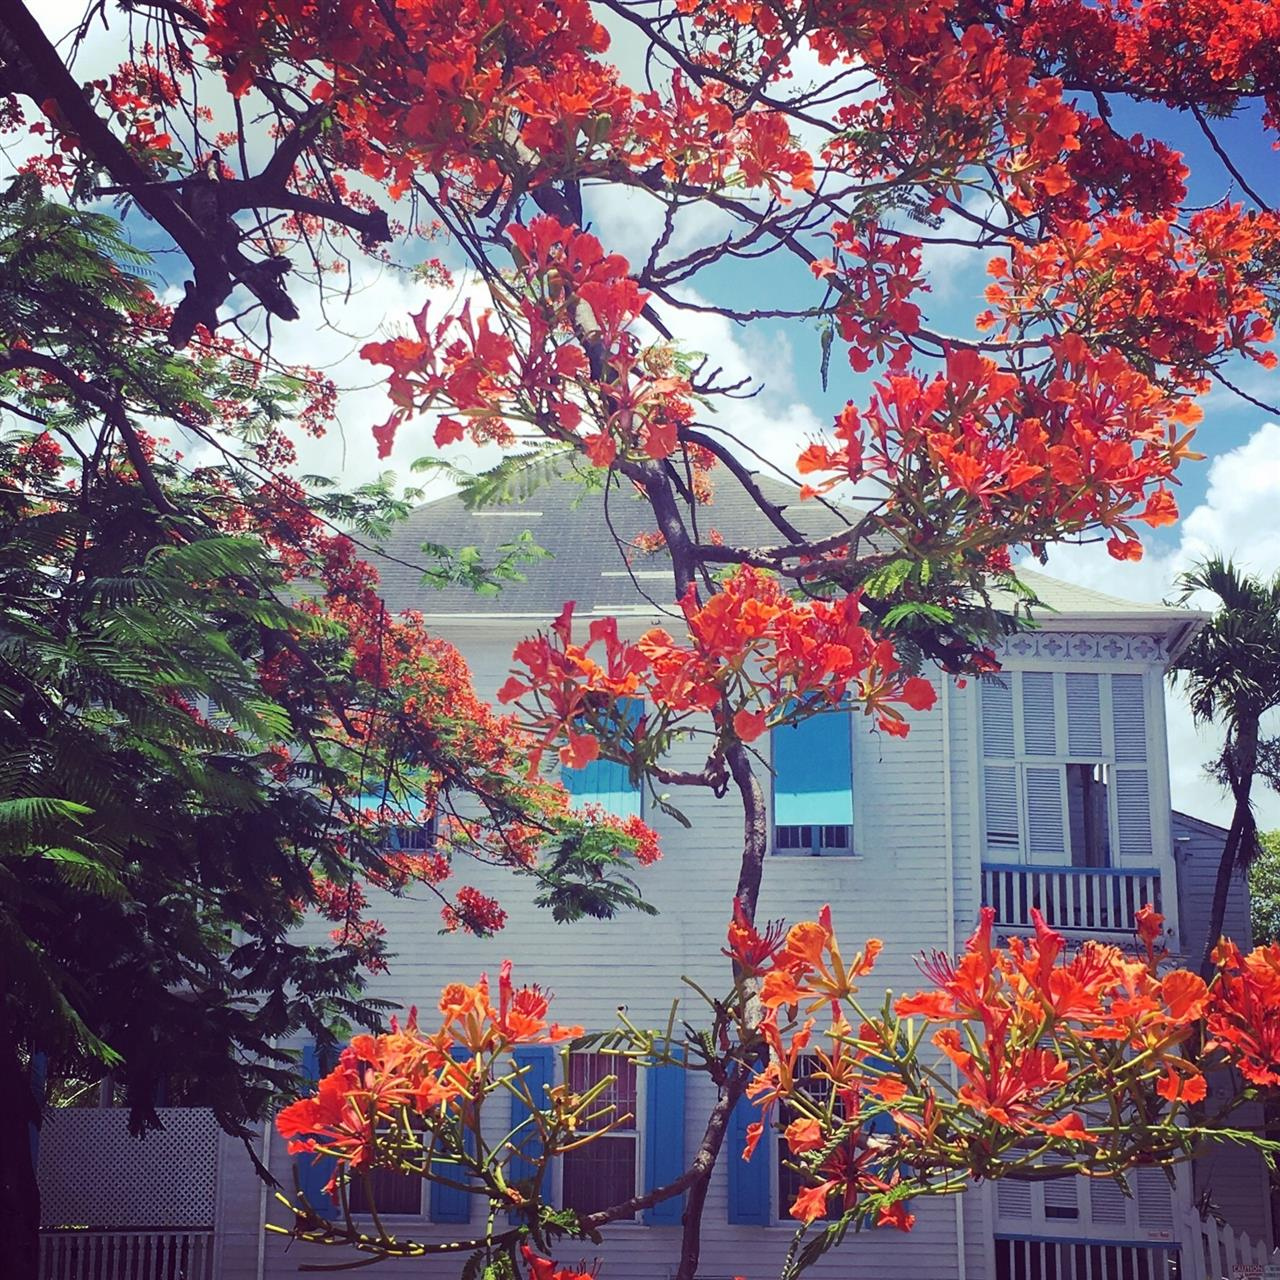 Poinciana in bloom, Nassau, Bahamas